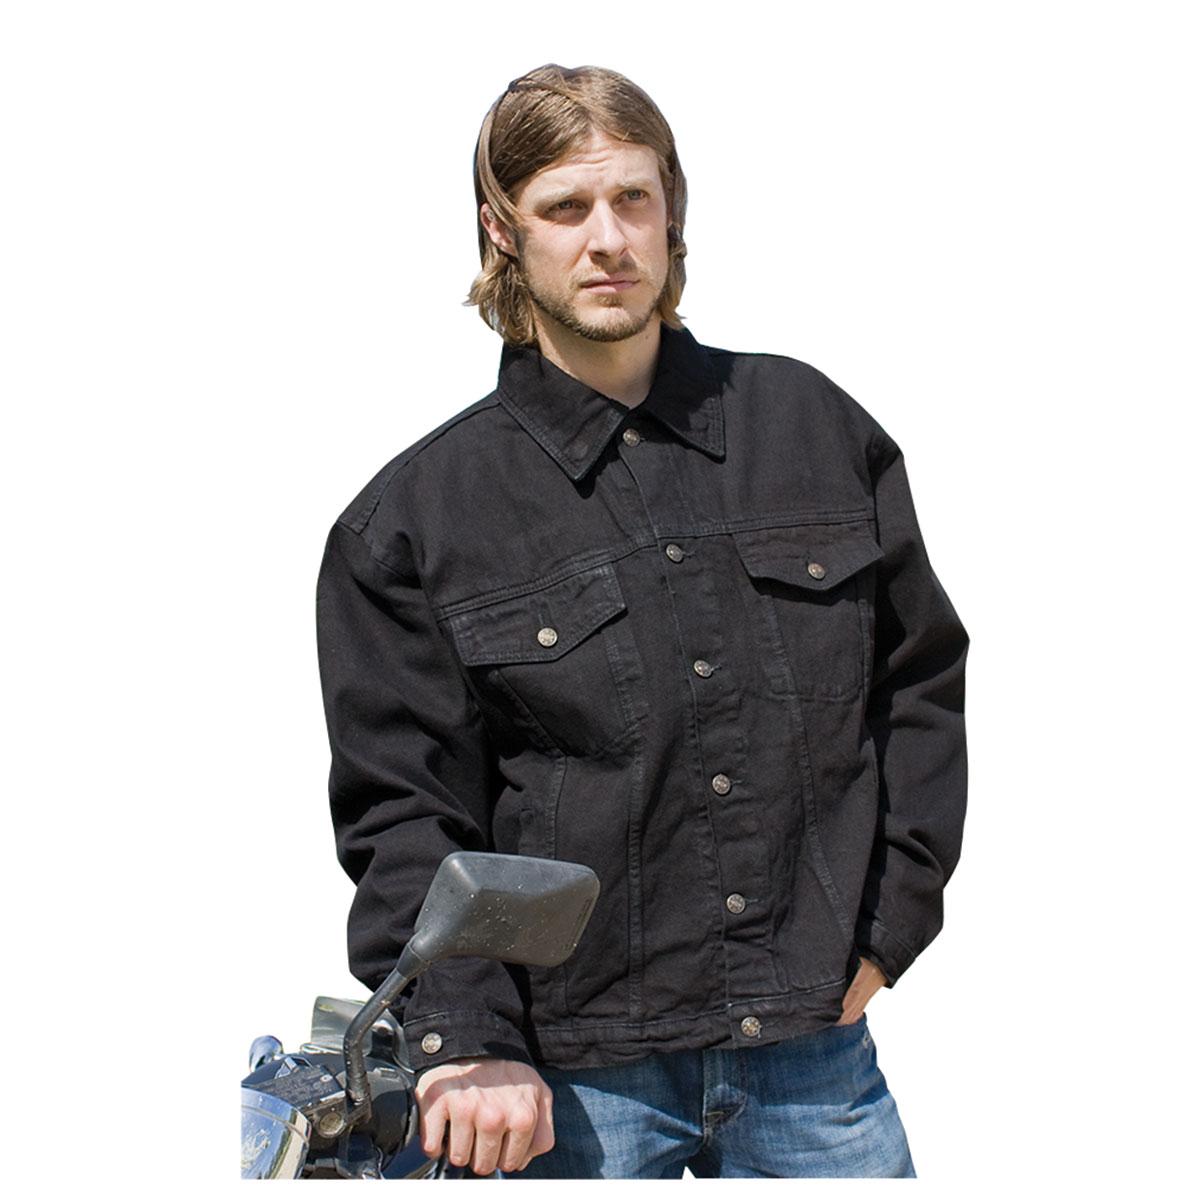 Allstate Leather Inc. Men's Black Denim Jacket | 634-241 | J&P Cycles